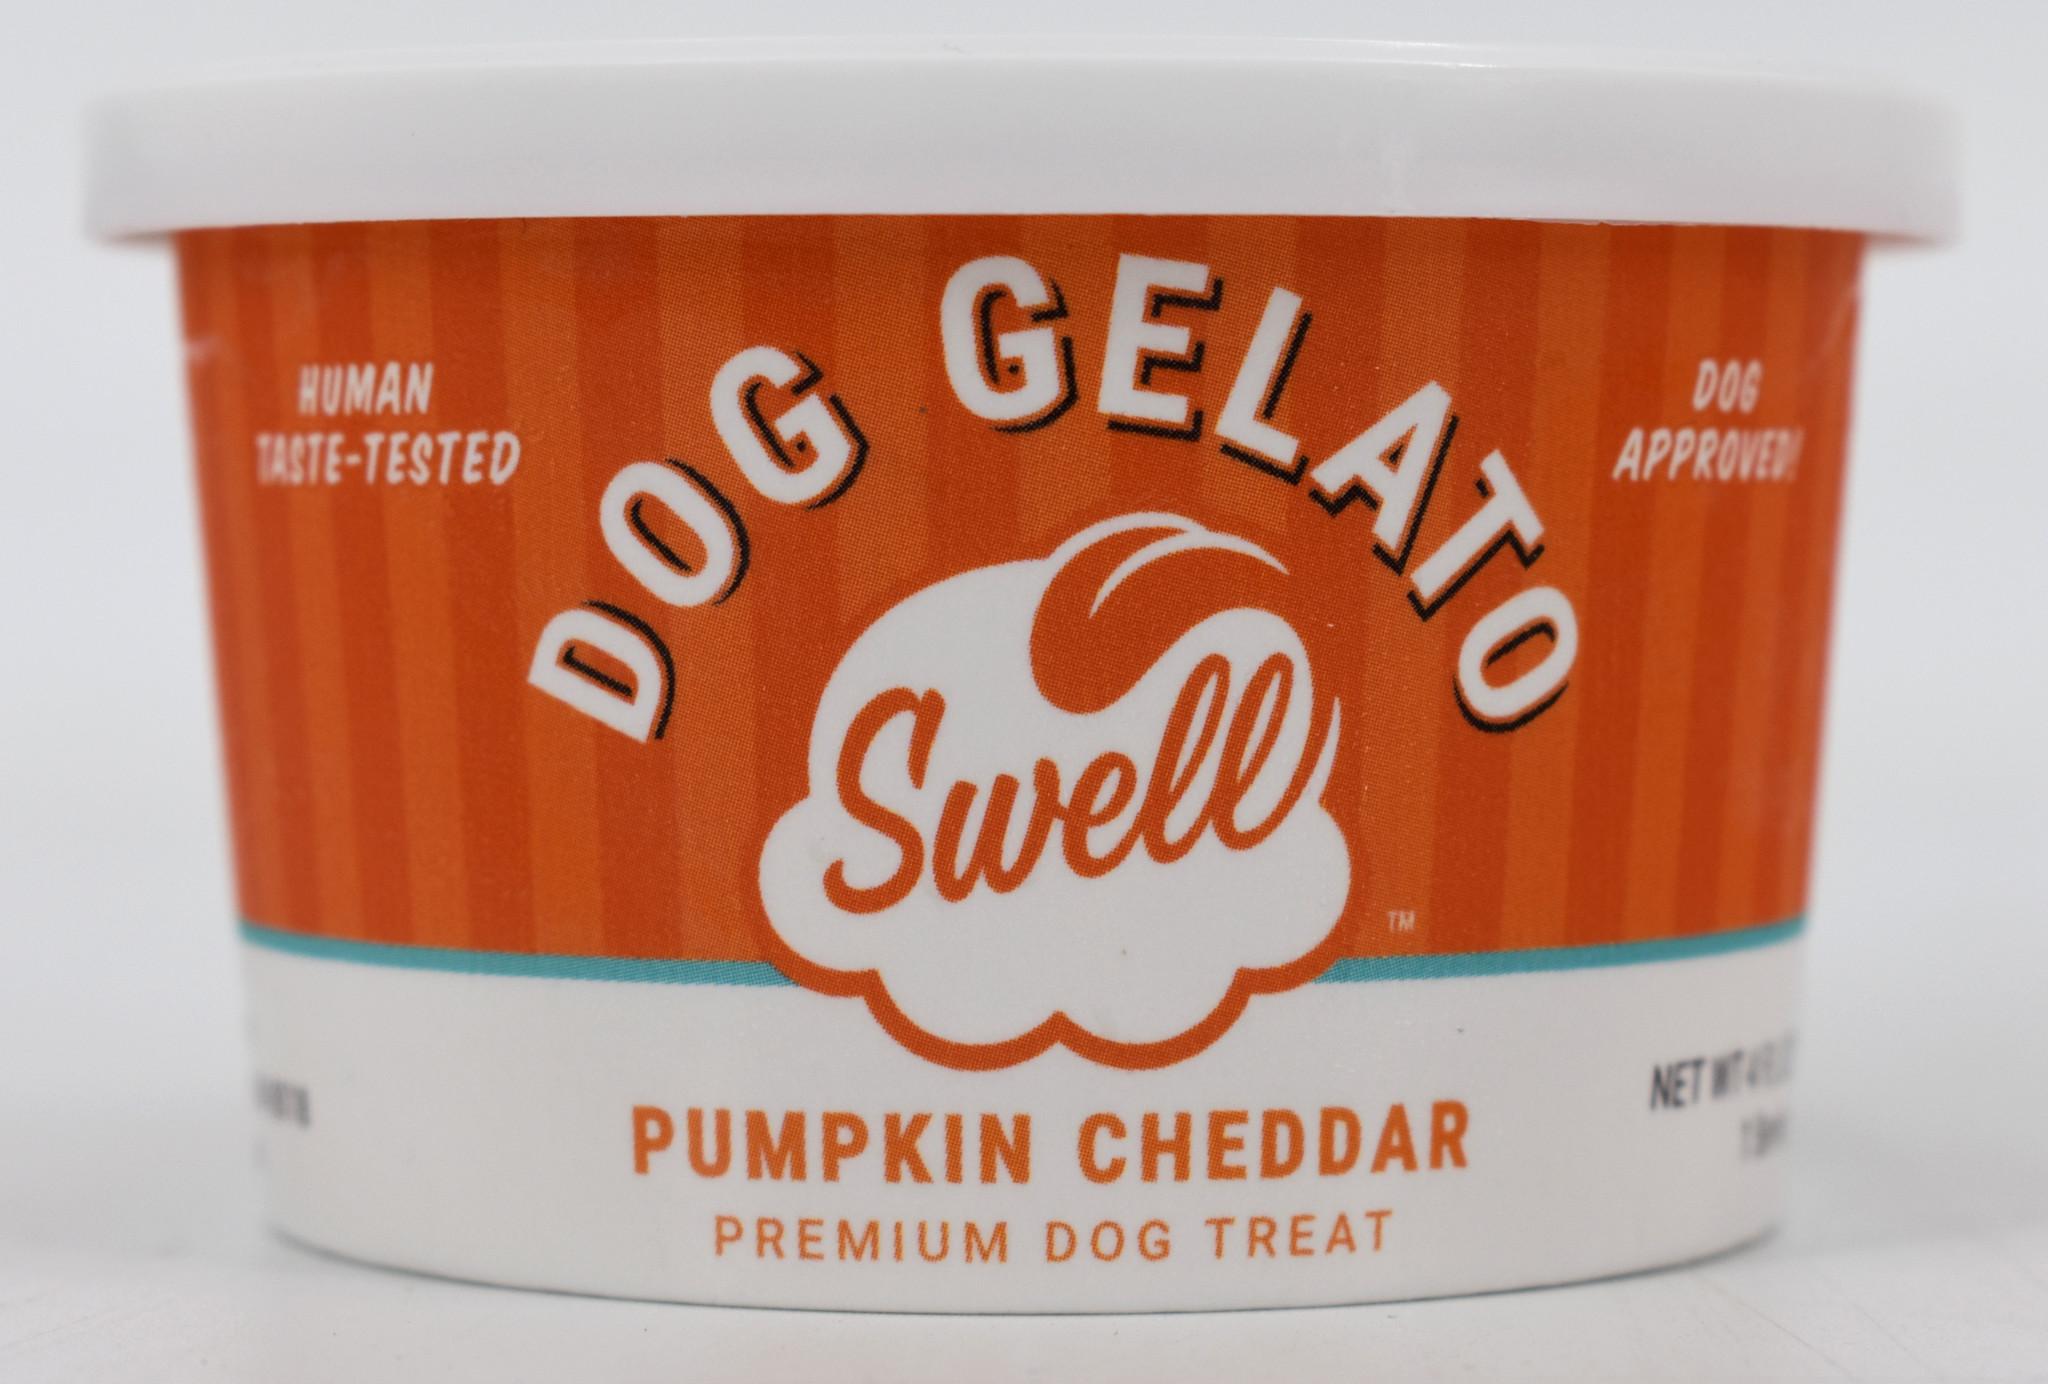 Swell Gelato Pumpkin Cheddar Frozen Dog Treat